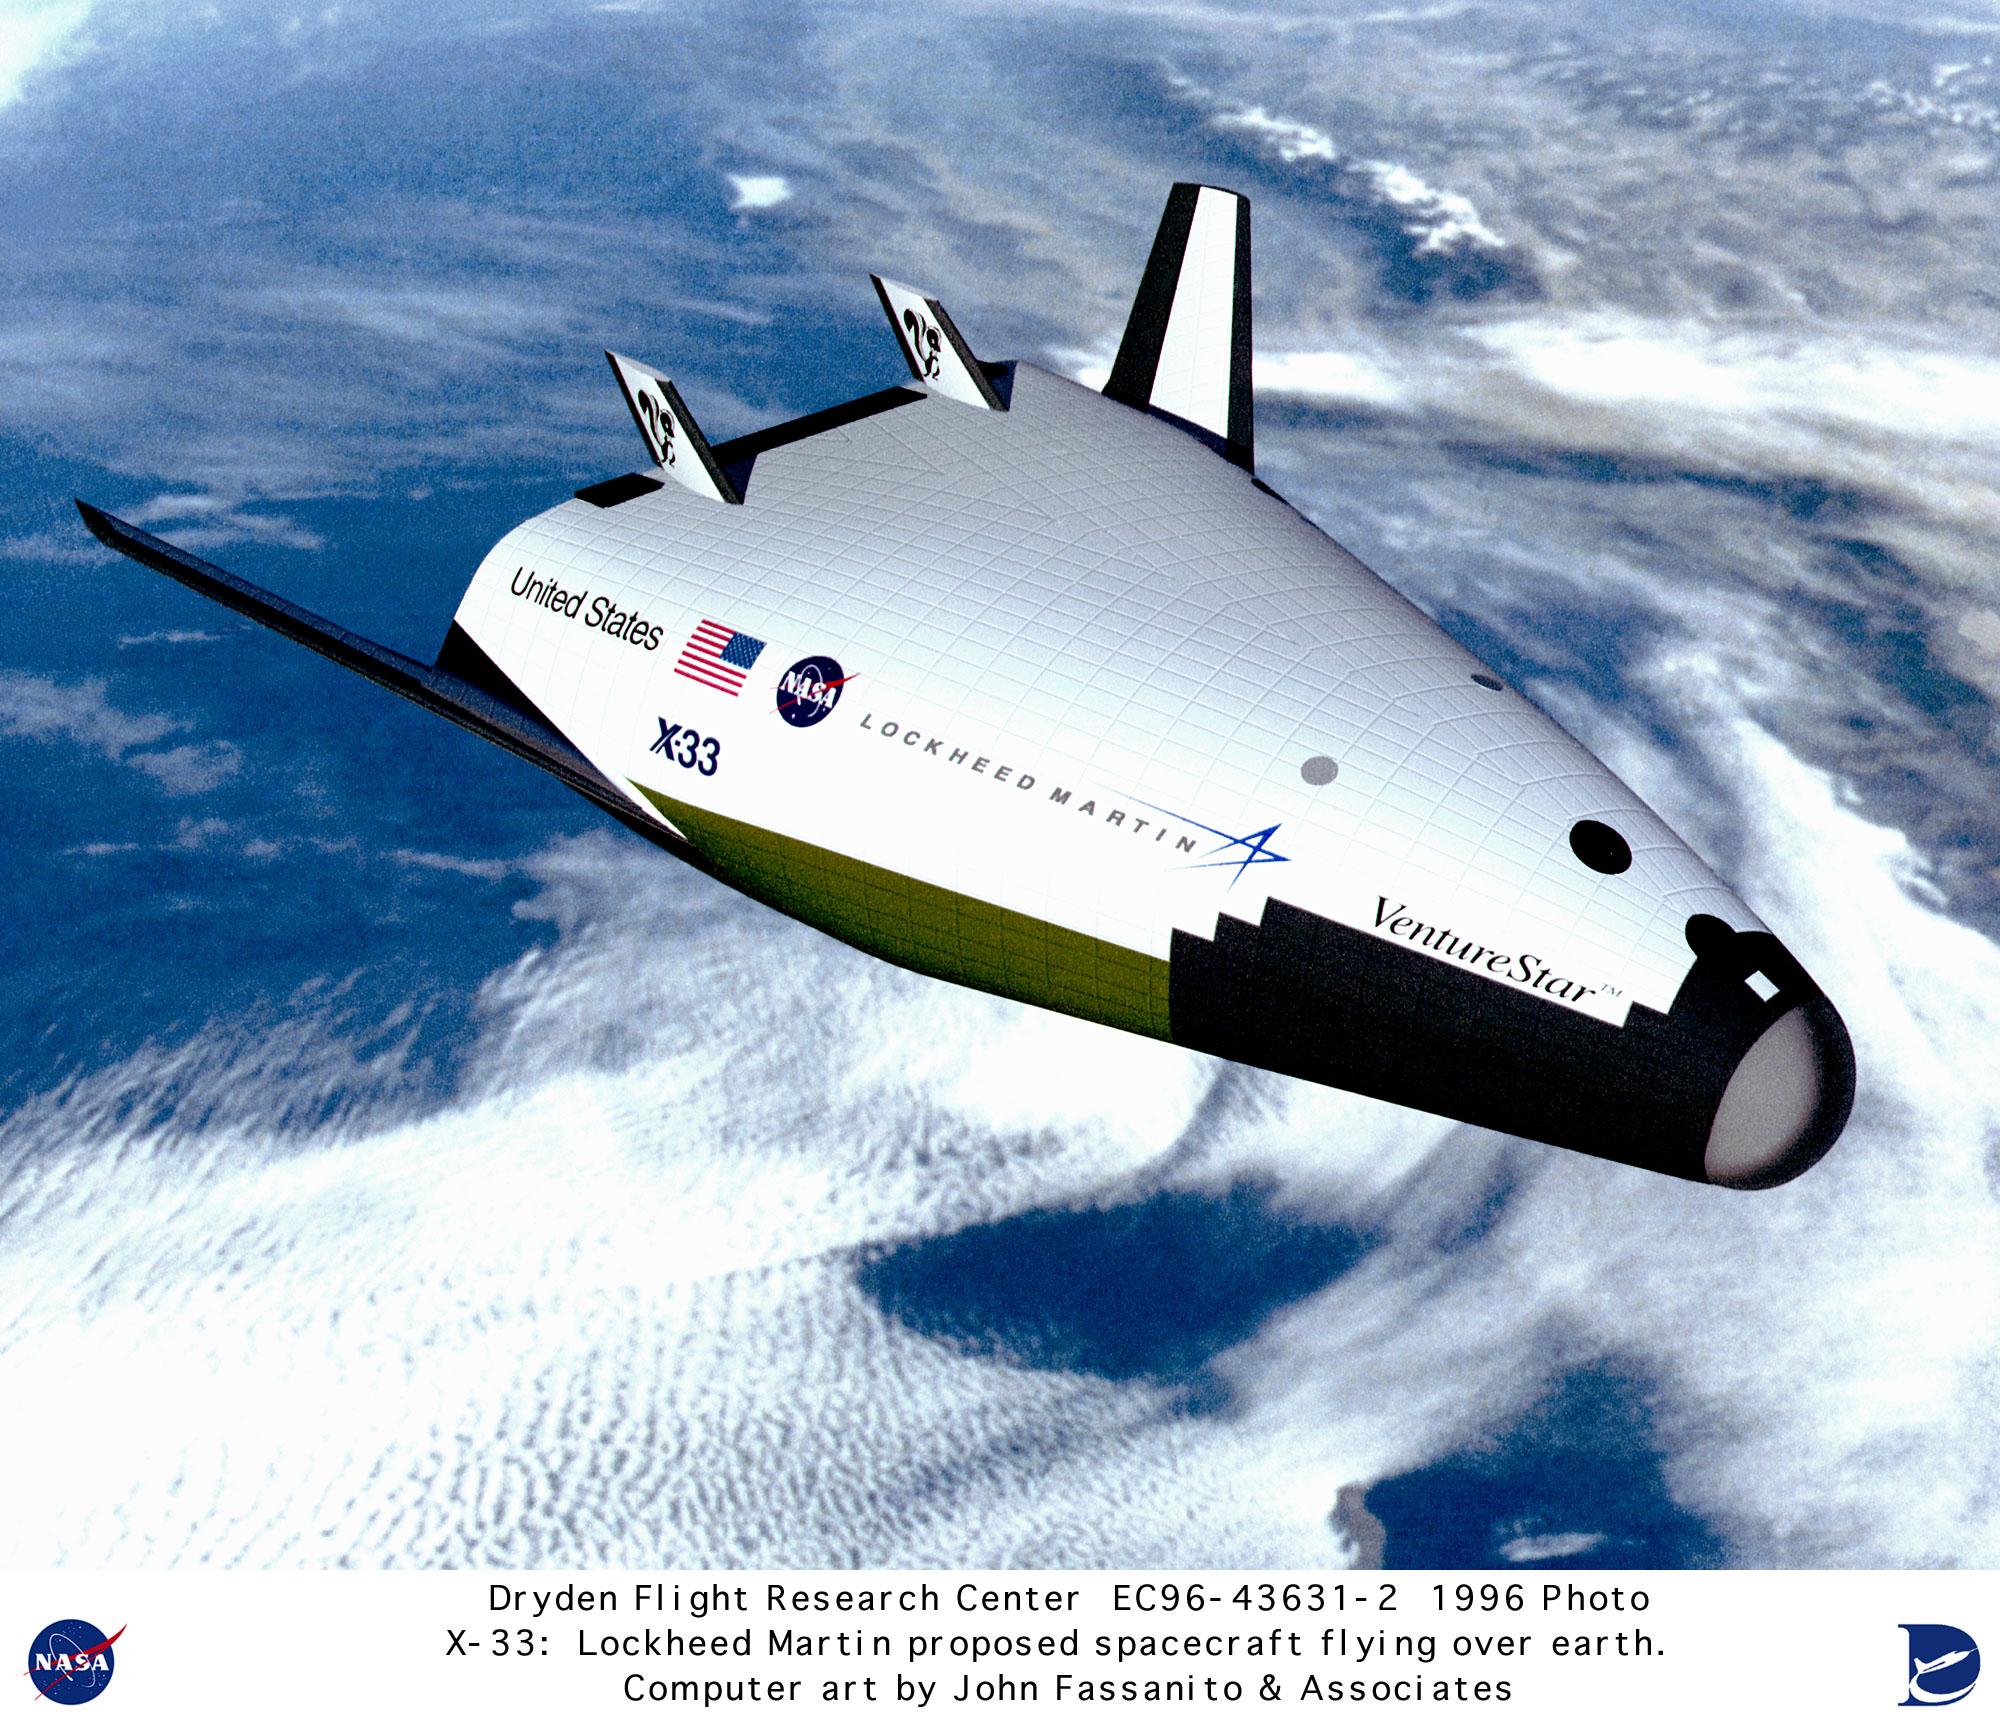 space shuttle x33 - photo #26